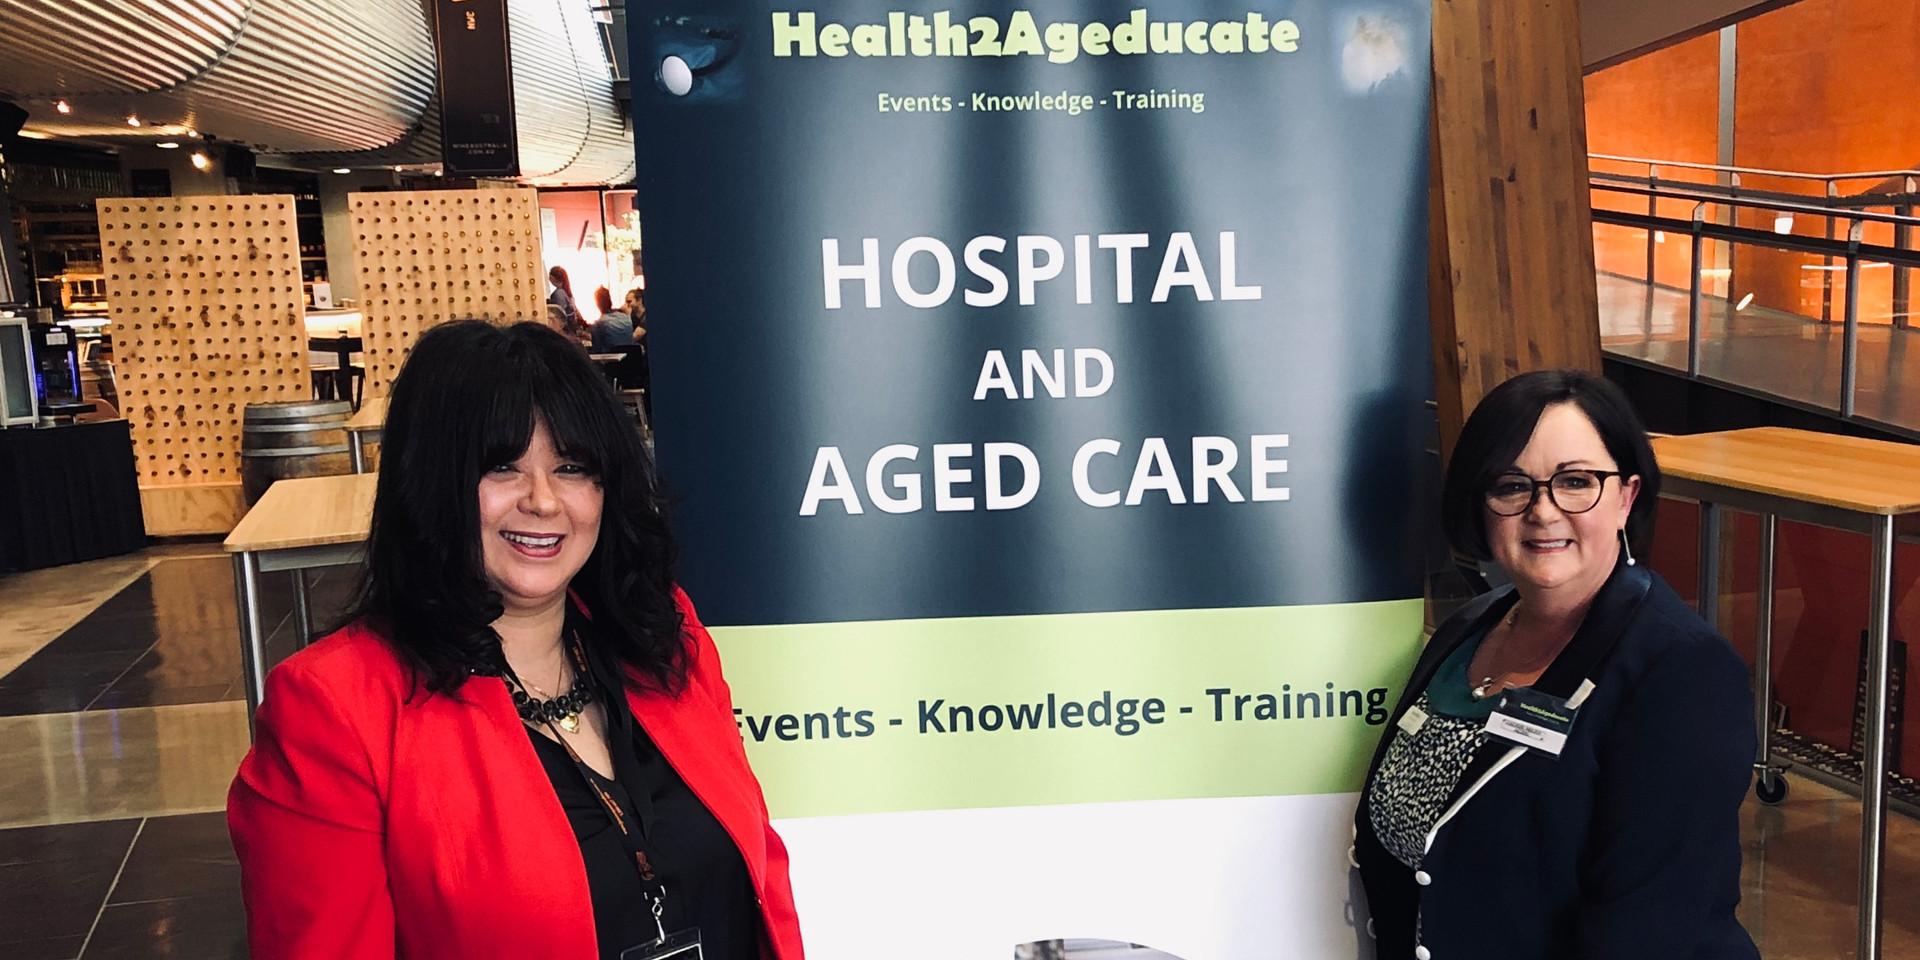 Adelaide Aged Care Seminar